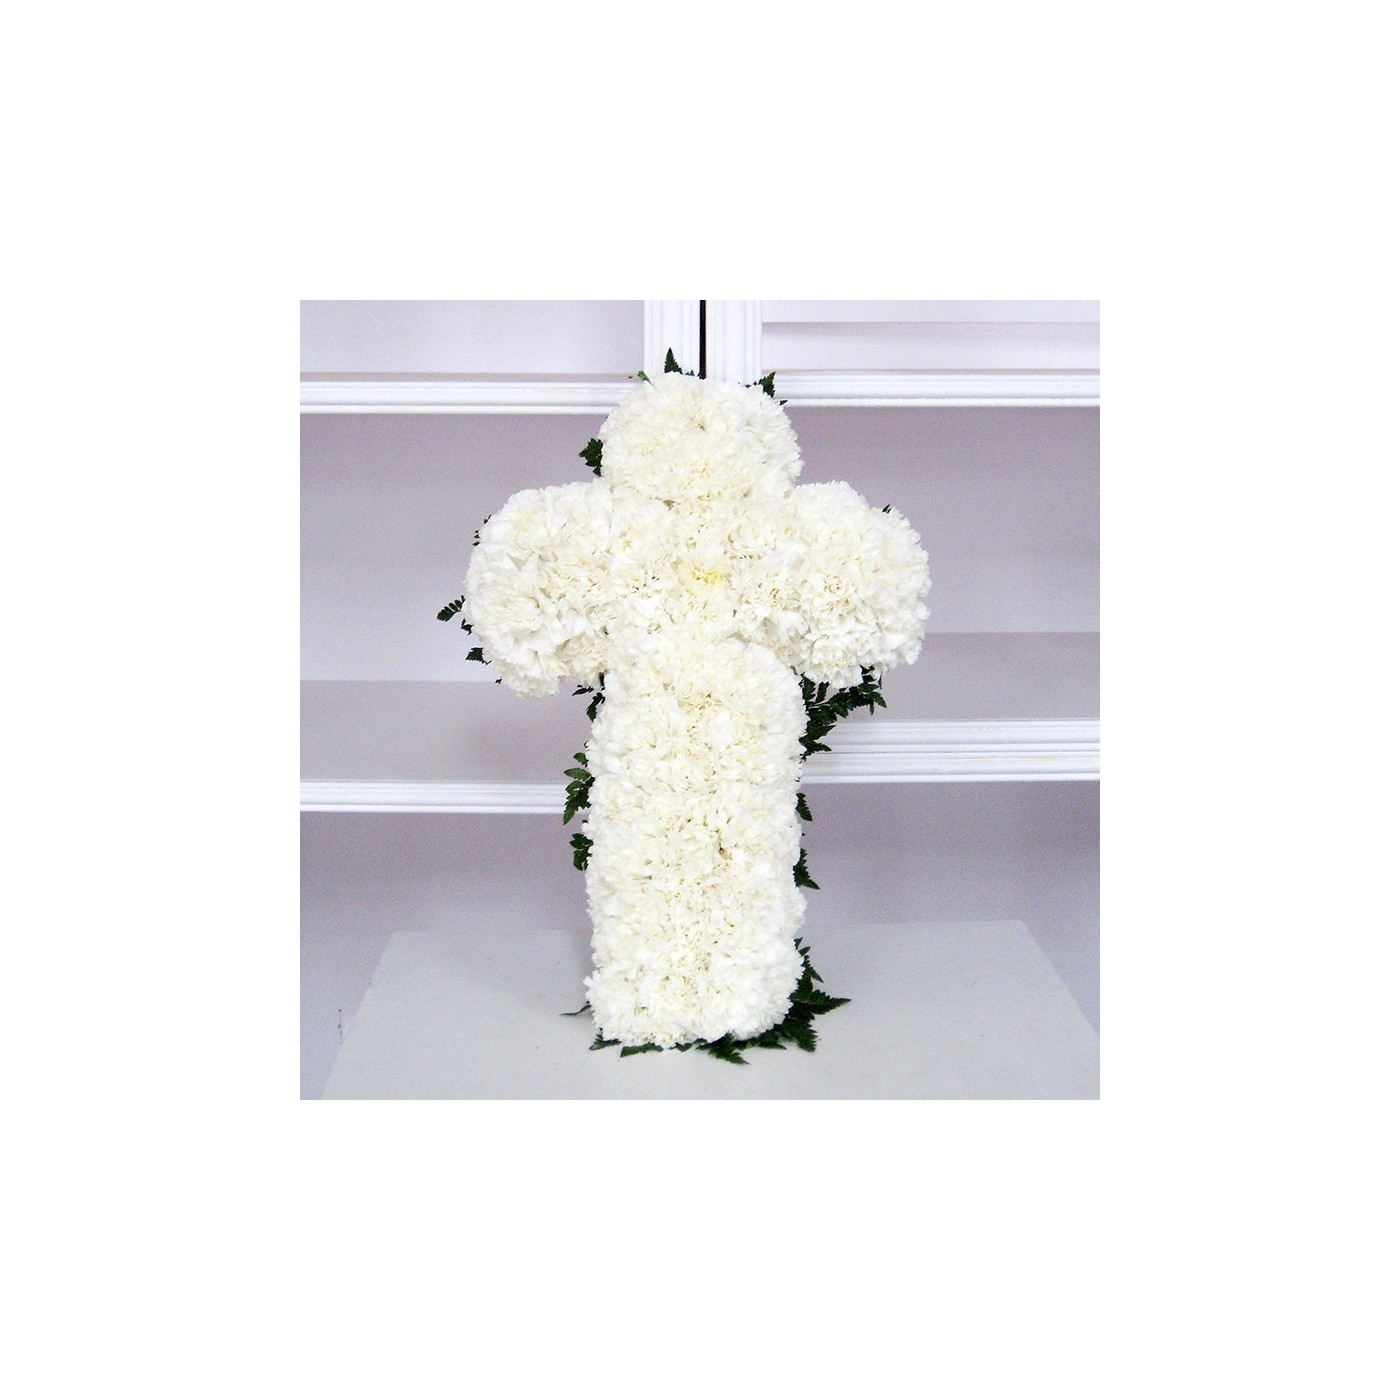 Cruz de claveles blancos